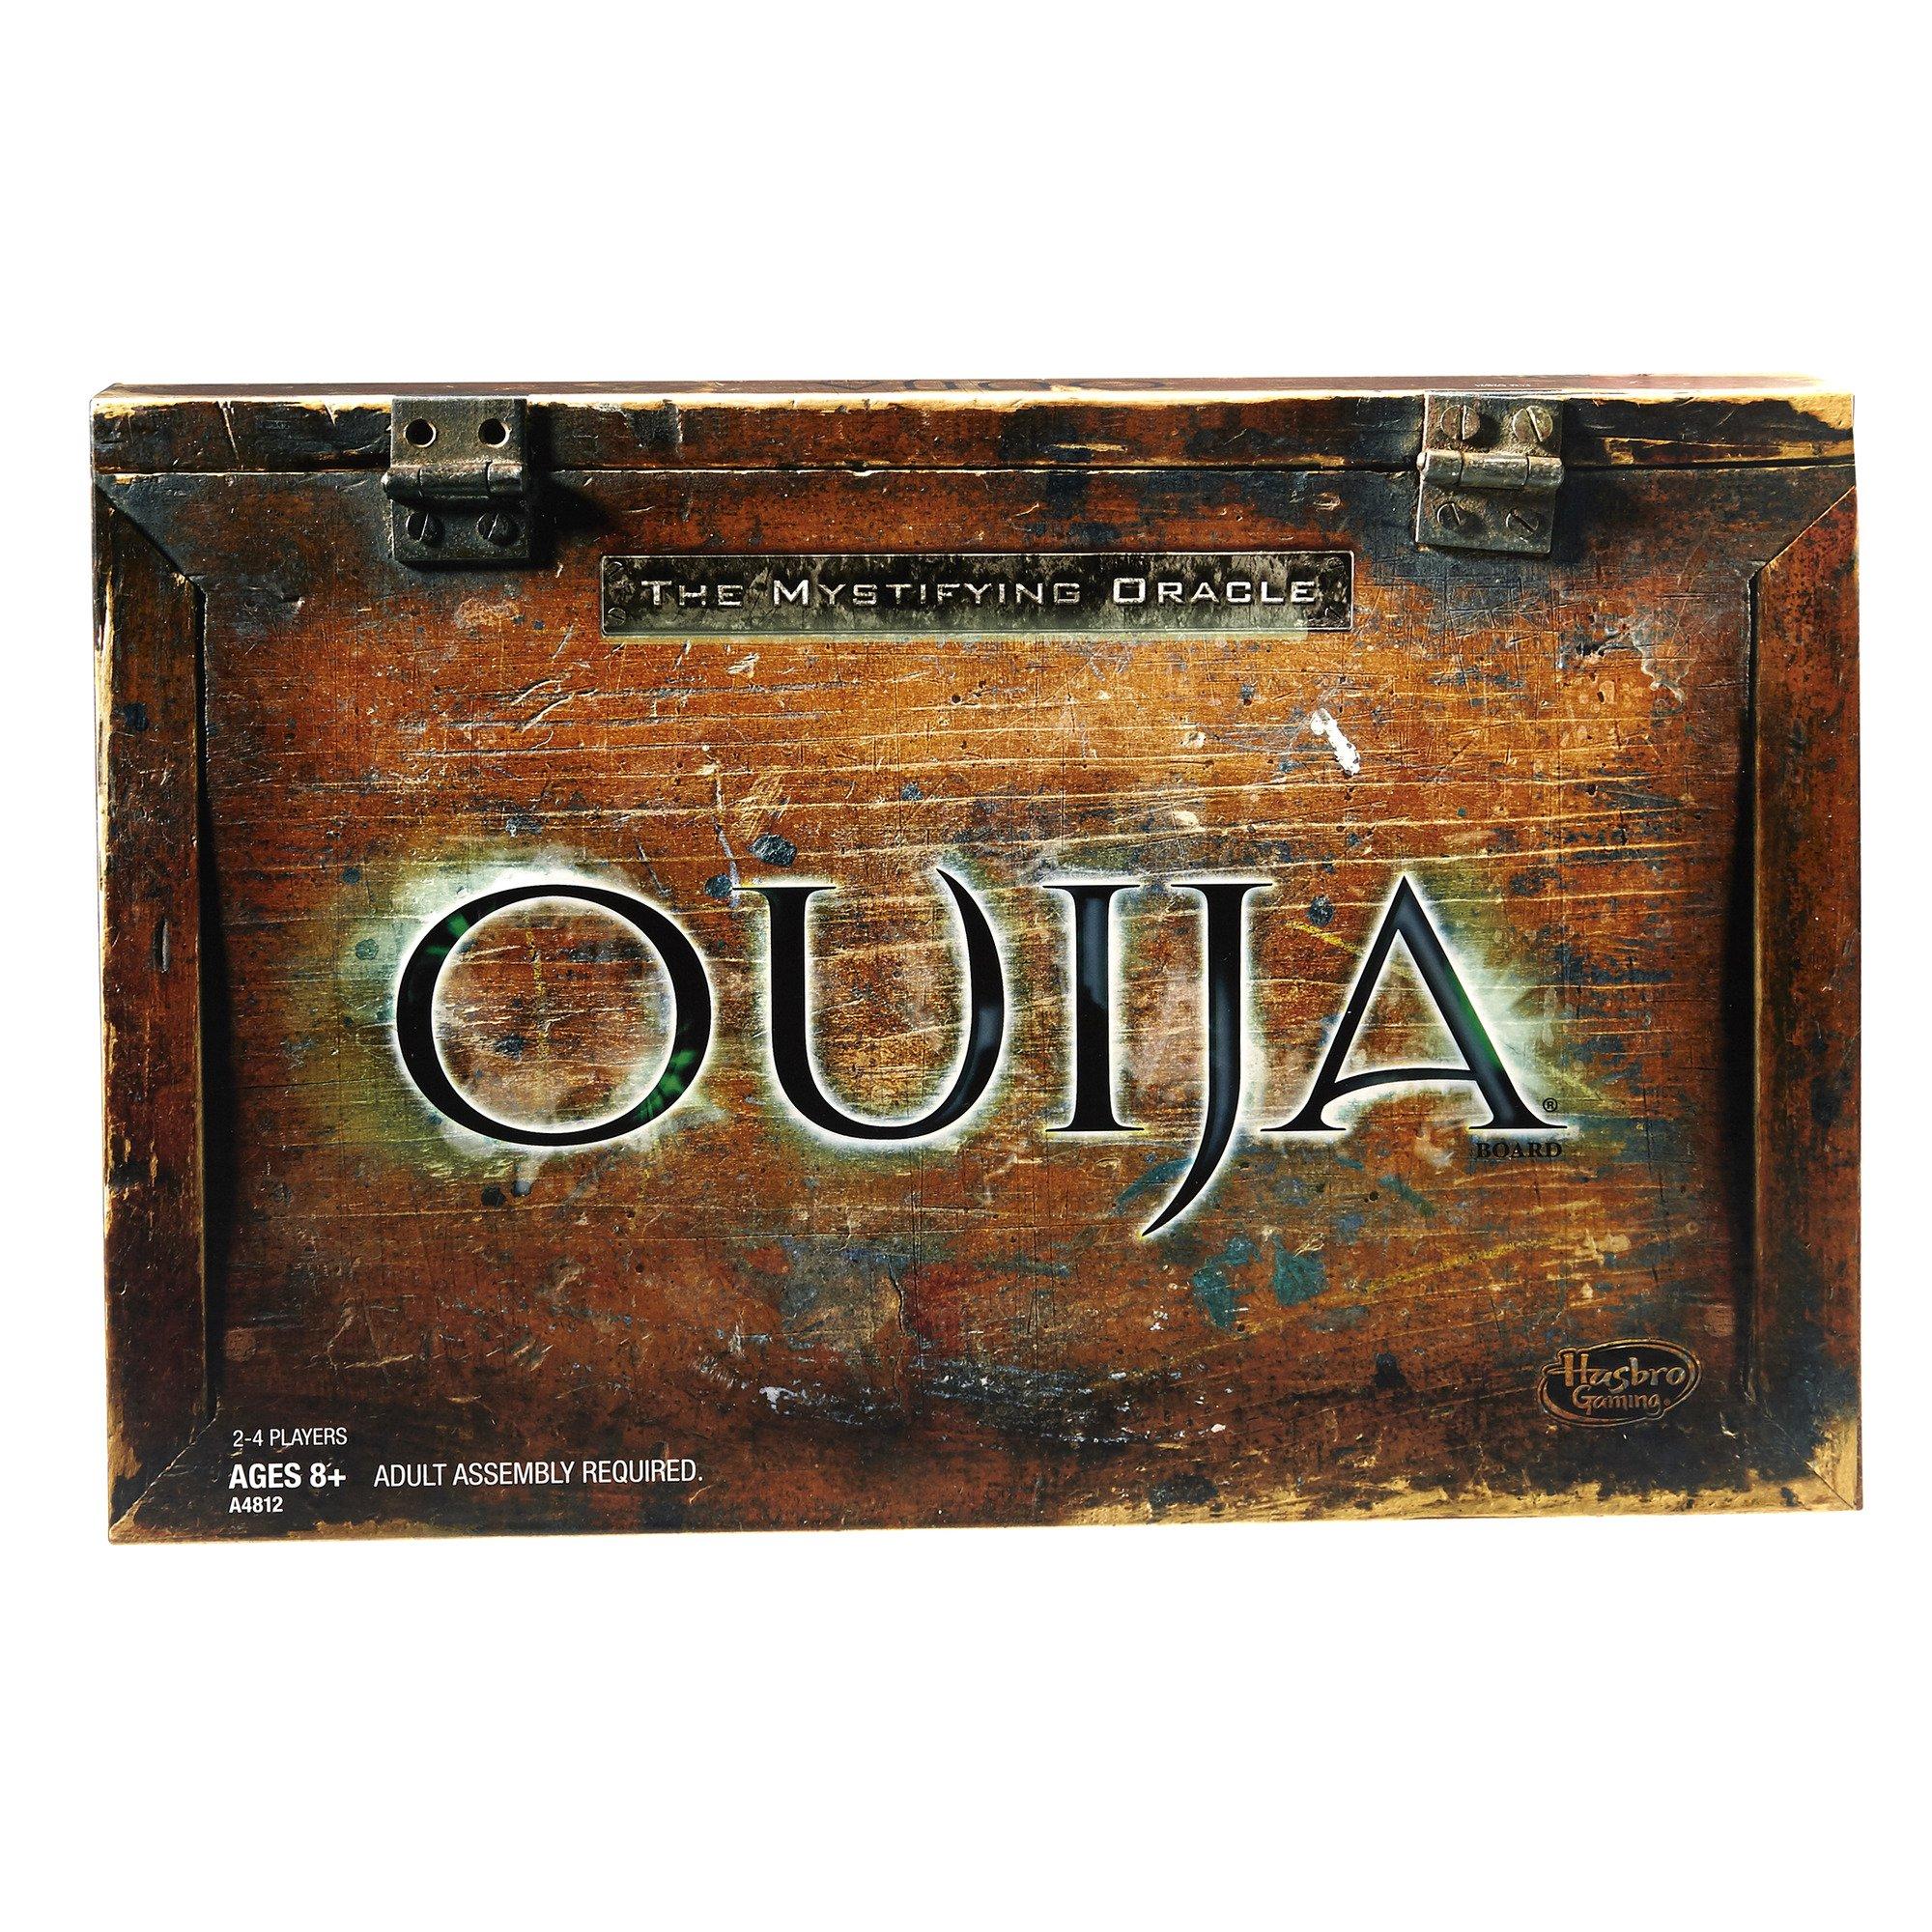 Hasbro A4812 Ouija Game